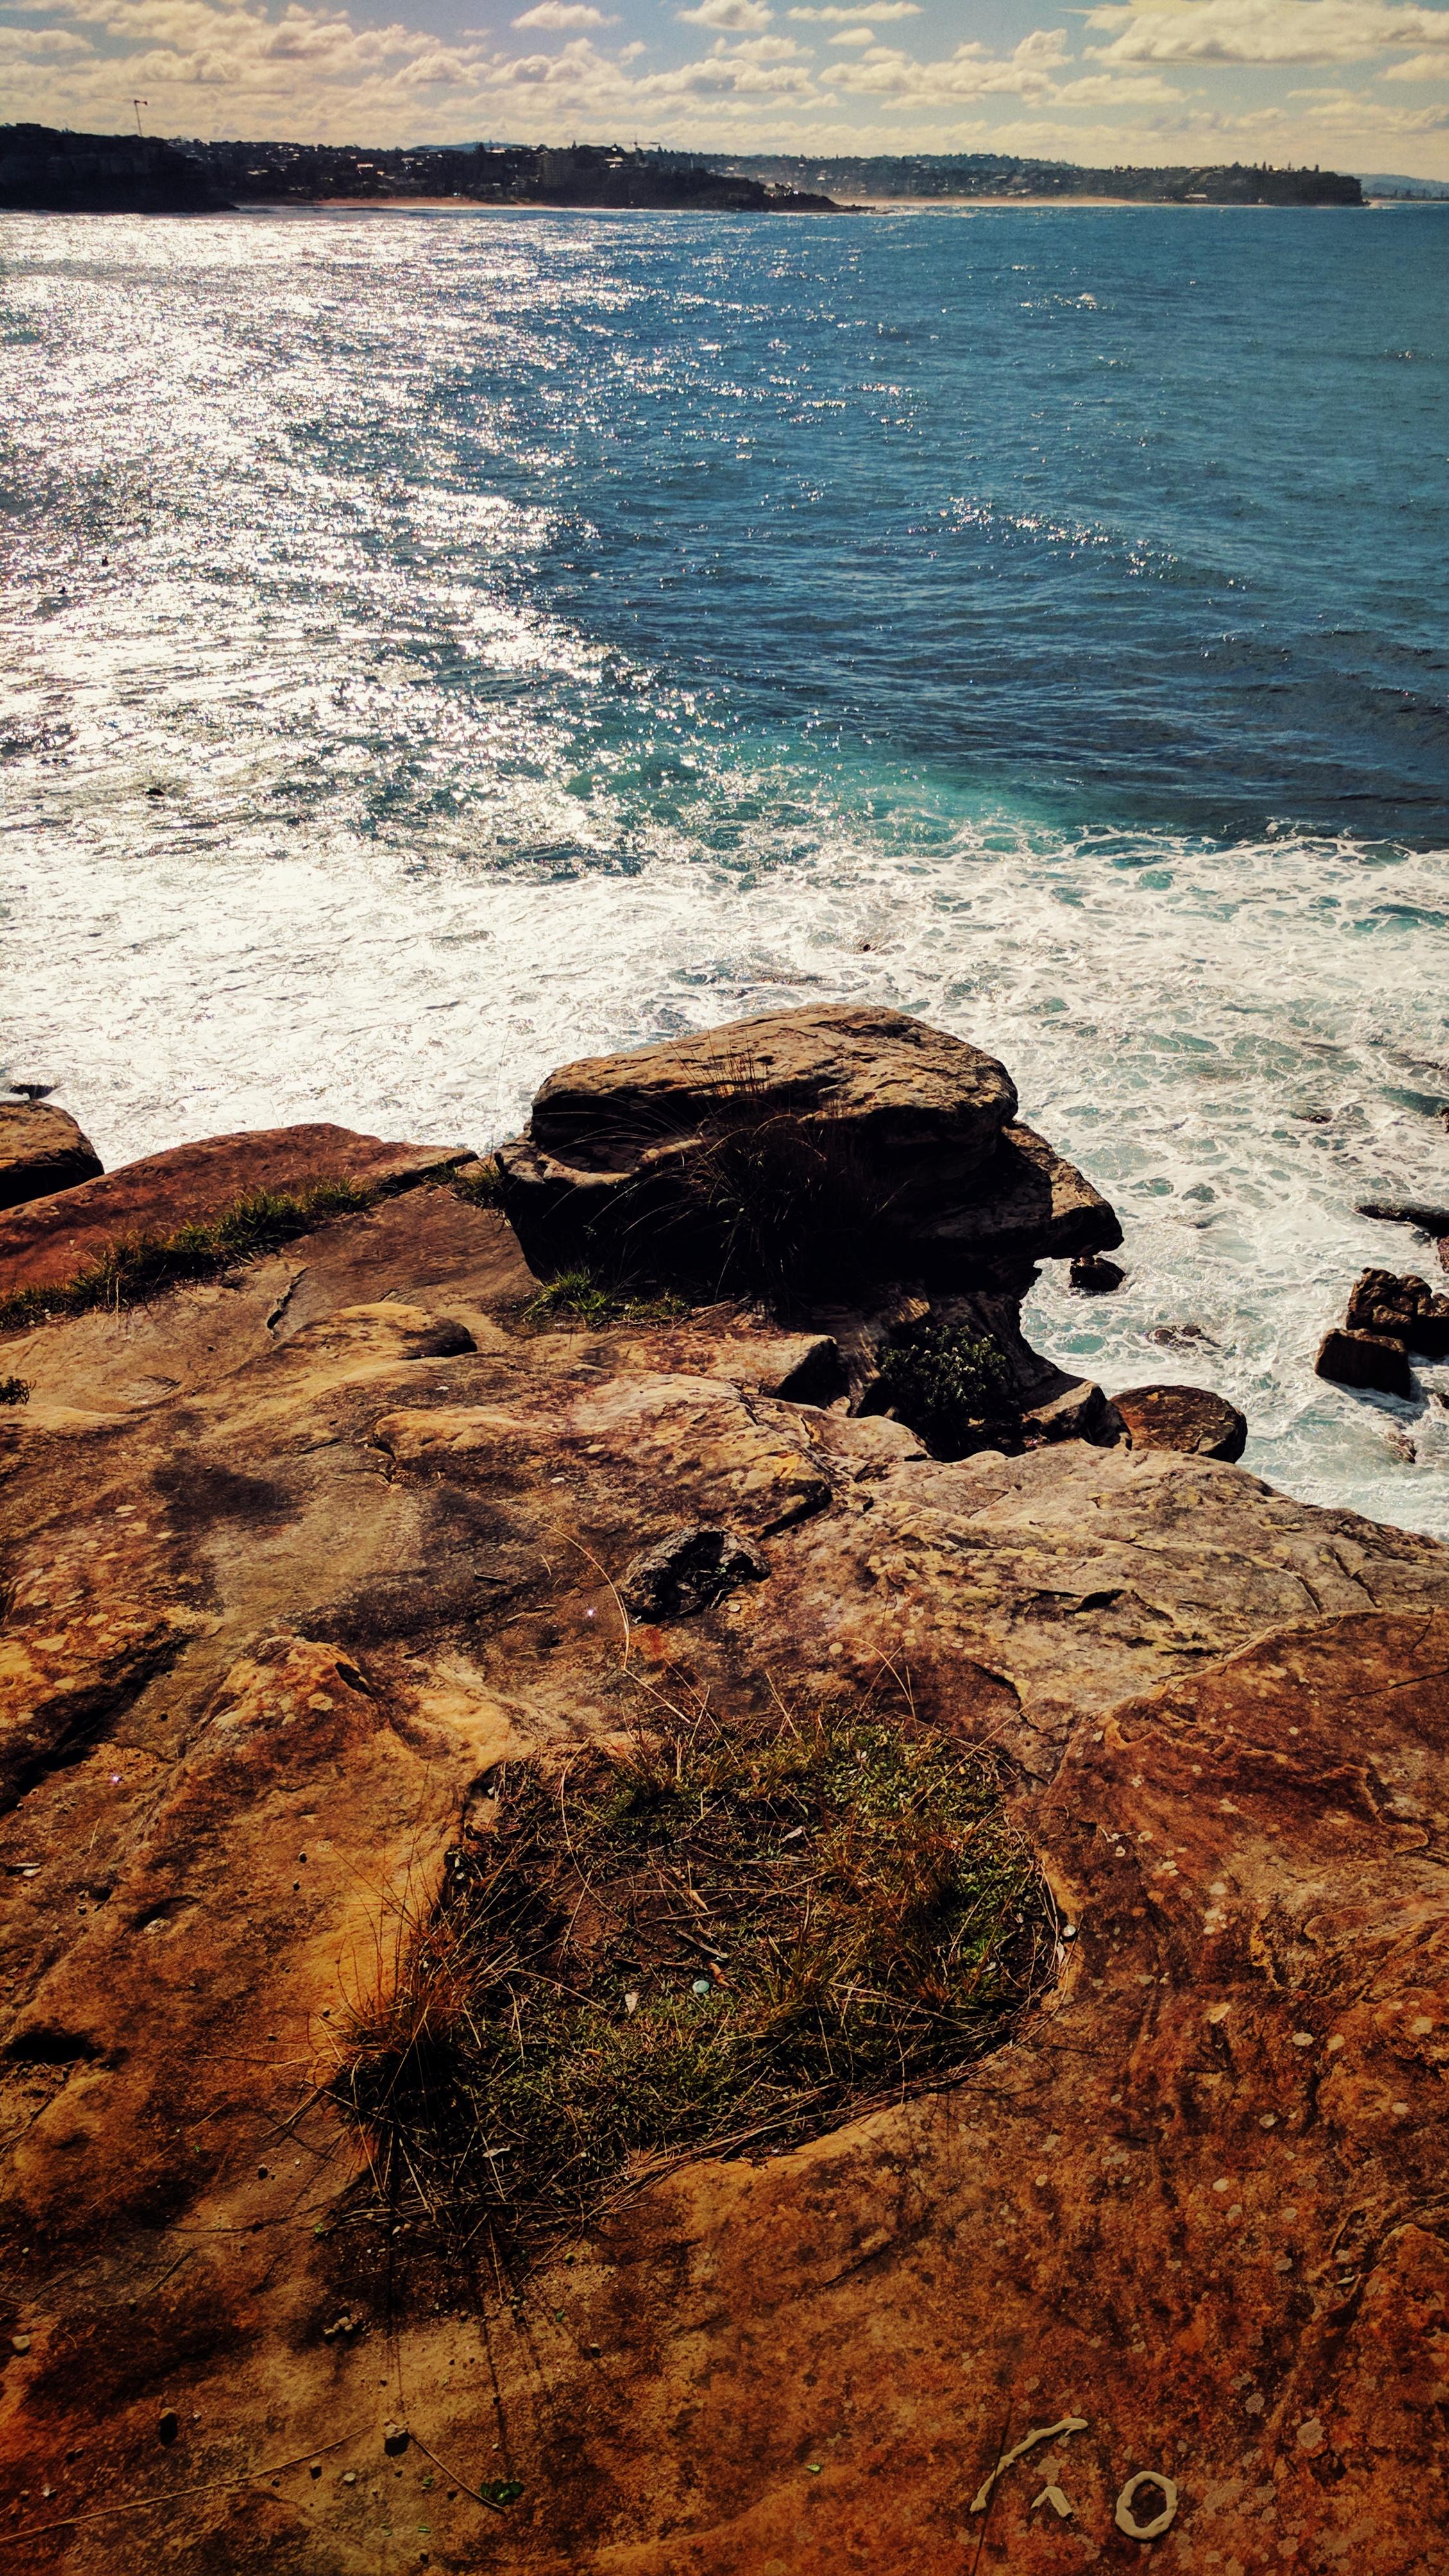 Shelly Head Lookout (Sydney, Australia)